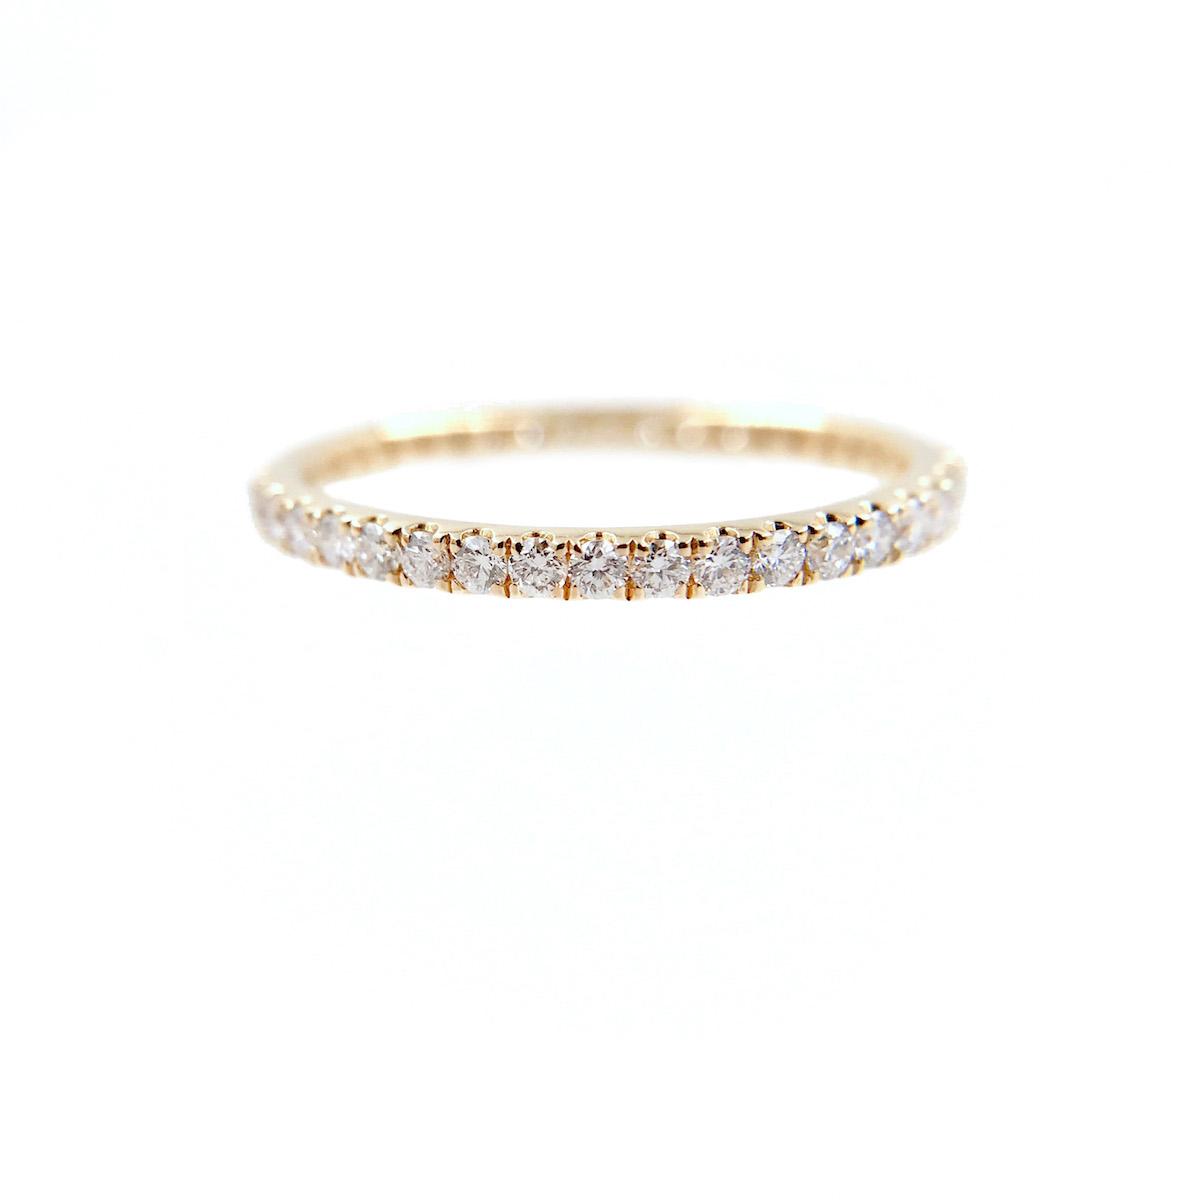 40-2mm-Pavé-Diamond-Eternity-Band-Ring-Guard-Spacer-14k-18k-JEWELYRIE_7740